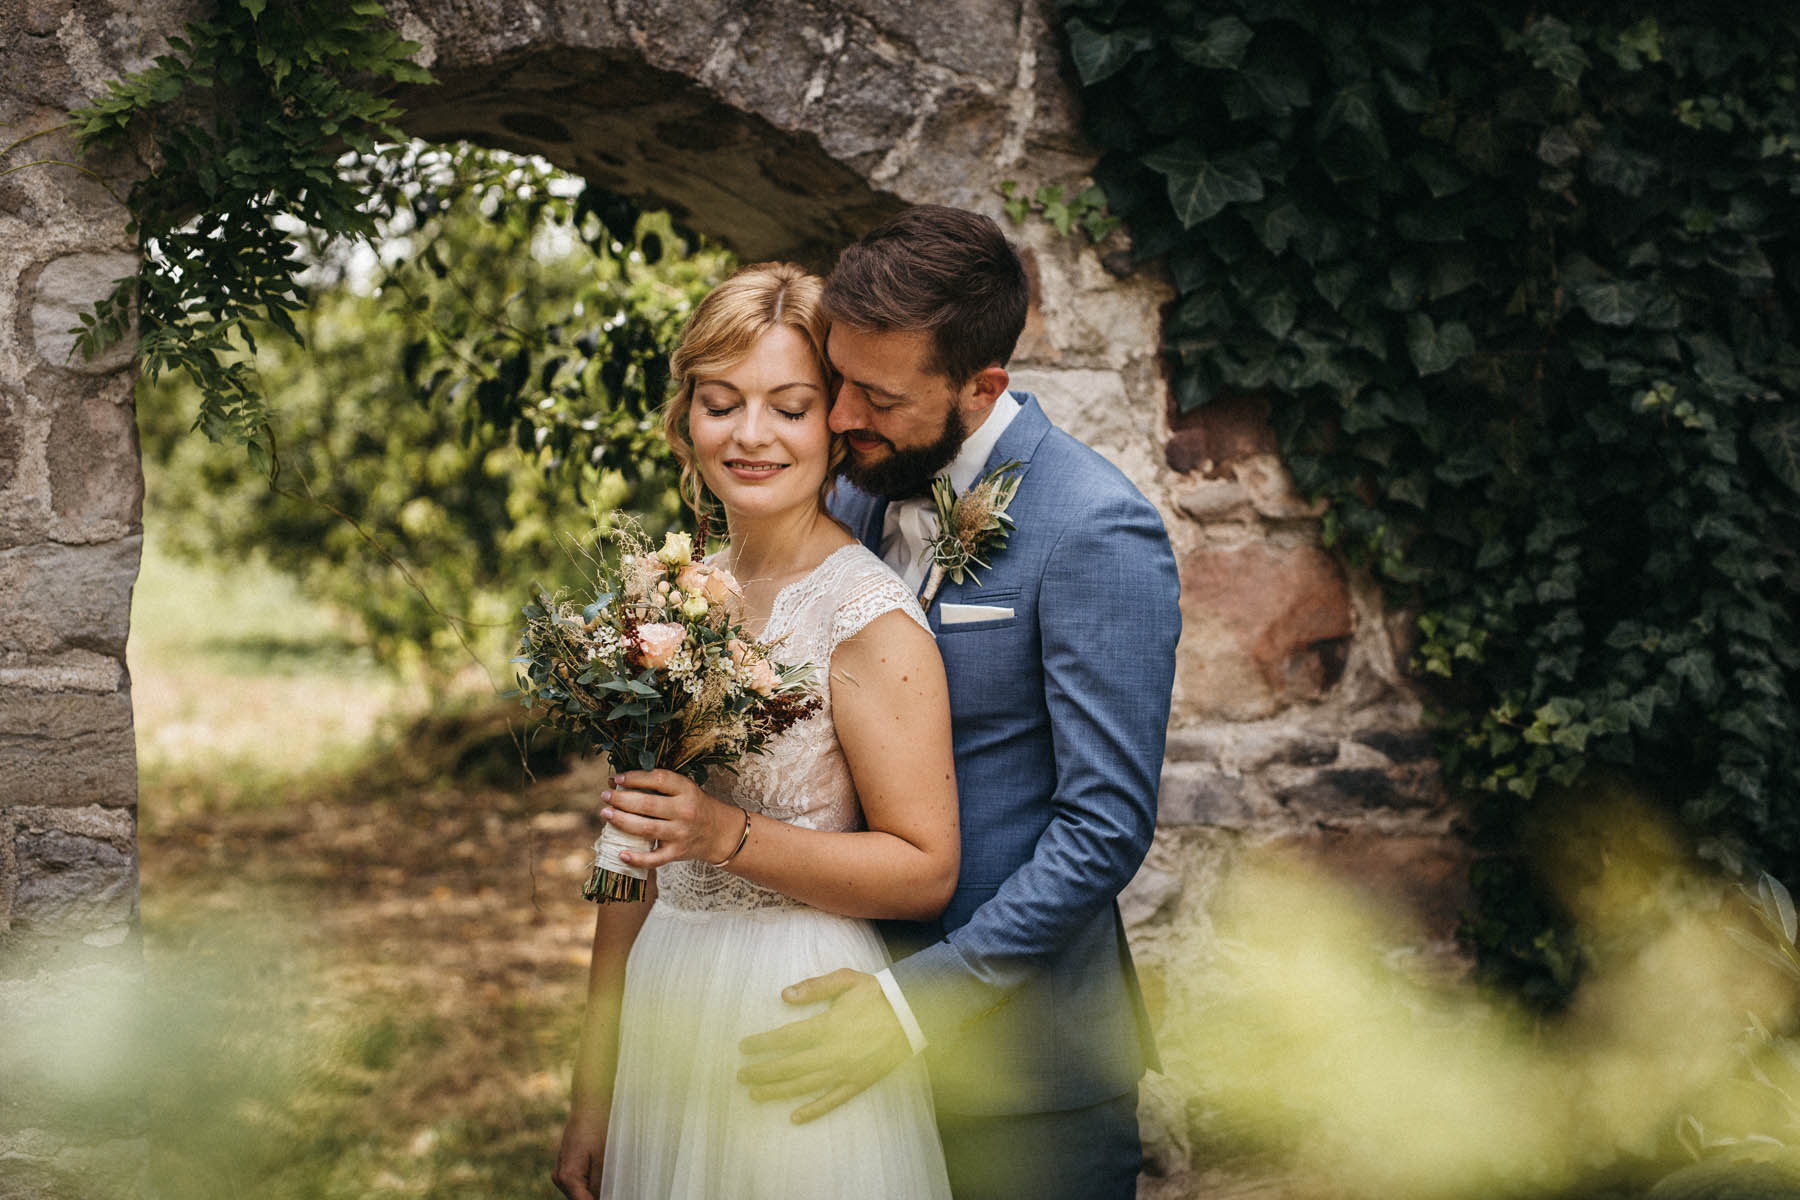 Brautpaar liebevoll im Garten des Wasserschloss Kleinbardorf | Raissa + Simon Fotografie